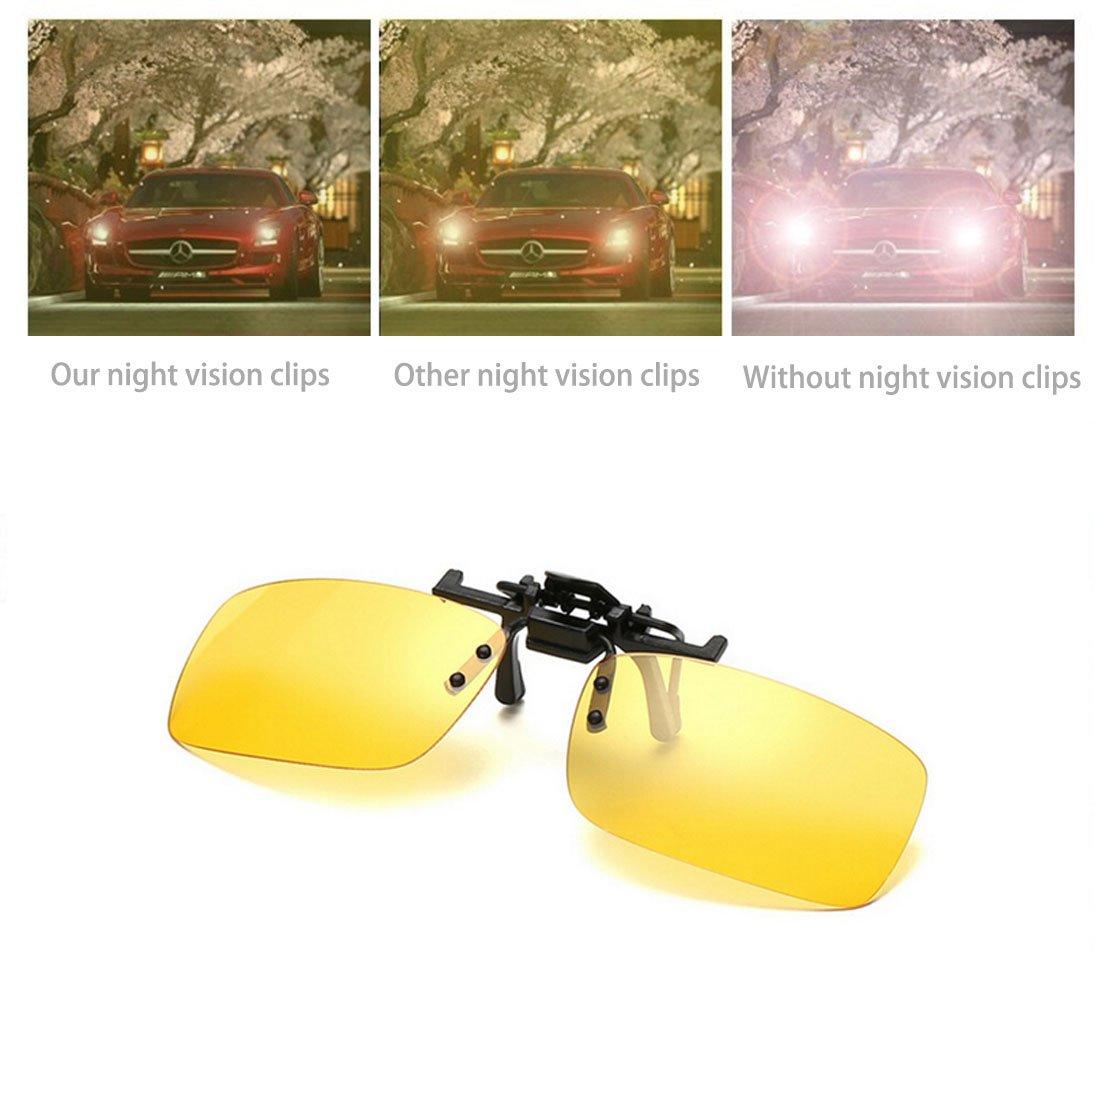 YiHao 2 pares de gafas de sol unisex Clip en lentes polarizados de visión nocturna, protección UV400 antirreflectante Drivingv caza esquí Deportes al ...